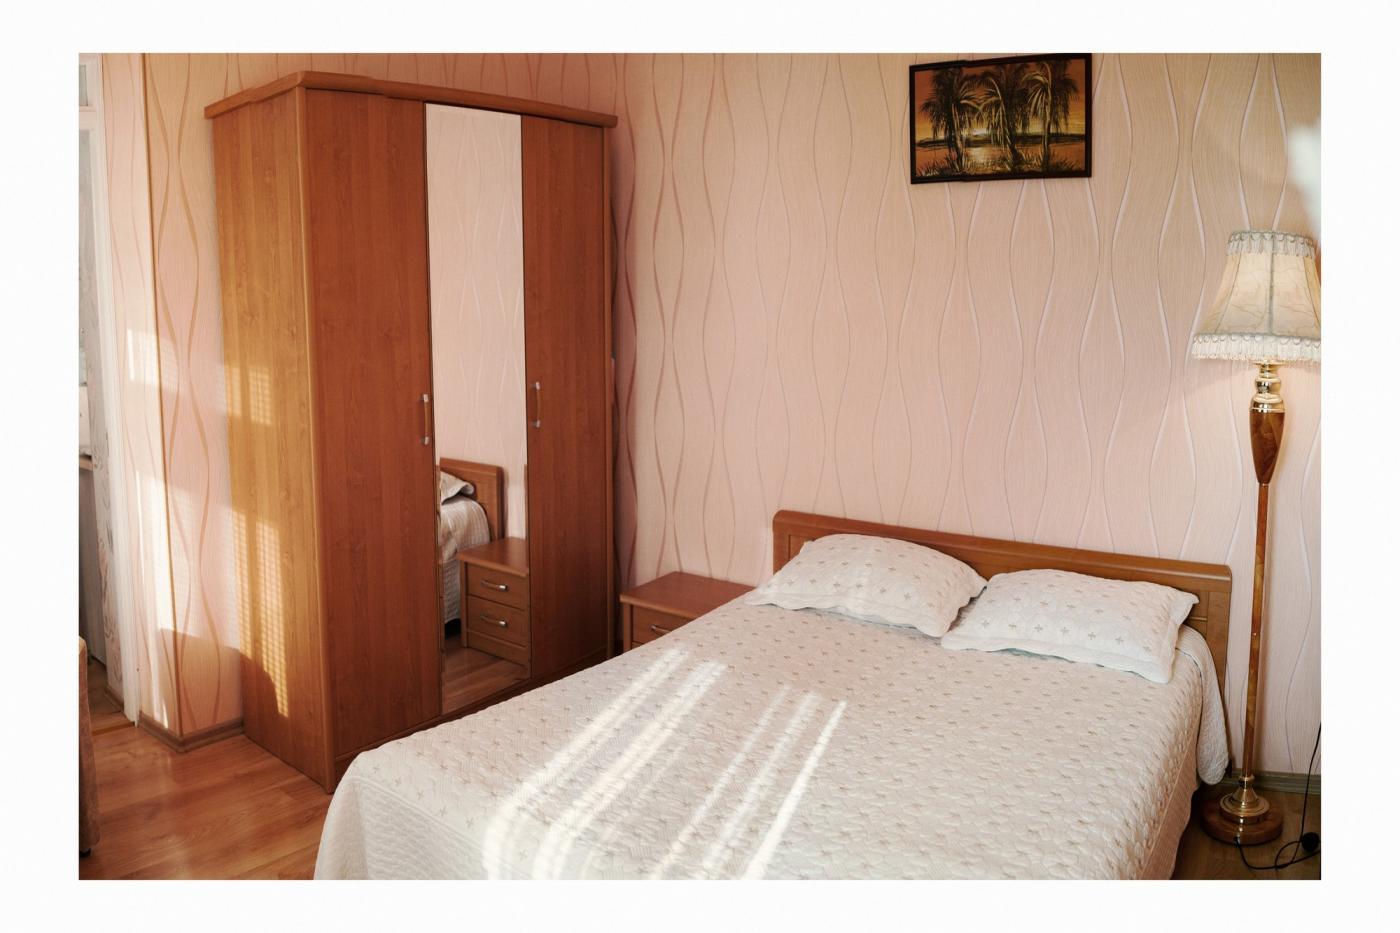 2-комнатная квартира посуточно (вариант № 1536), ул. Воронина улица, фото № 3